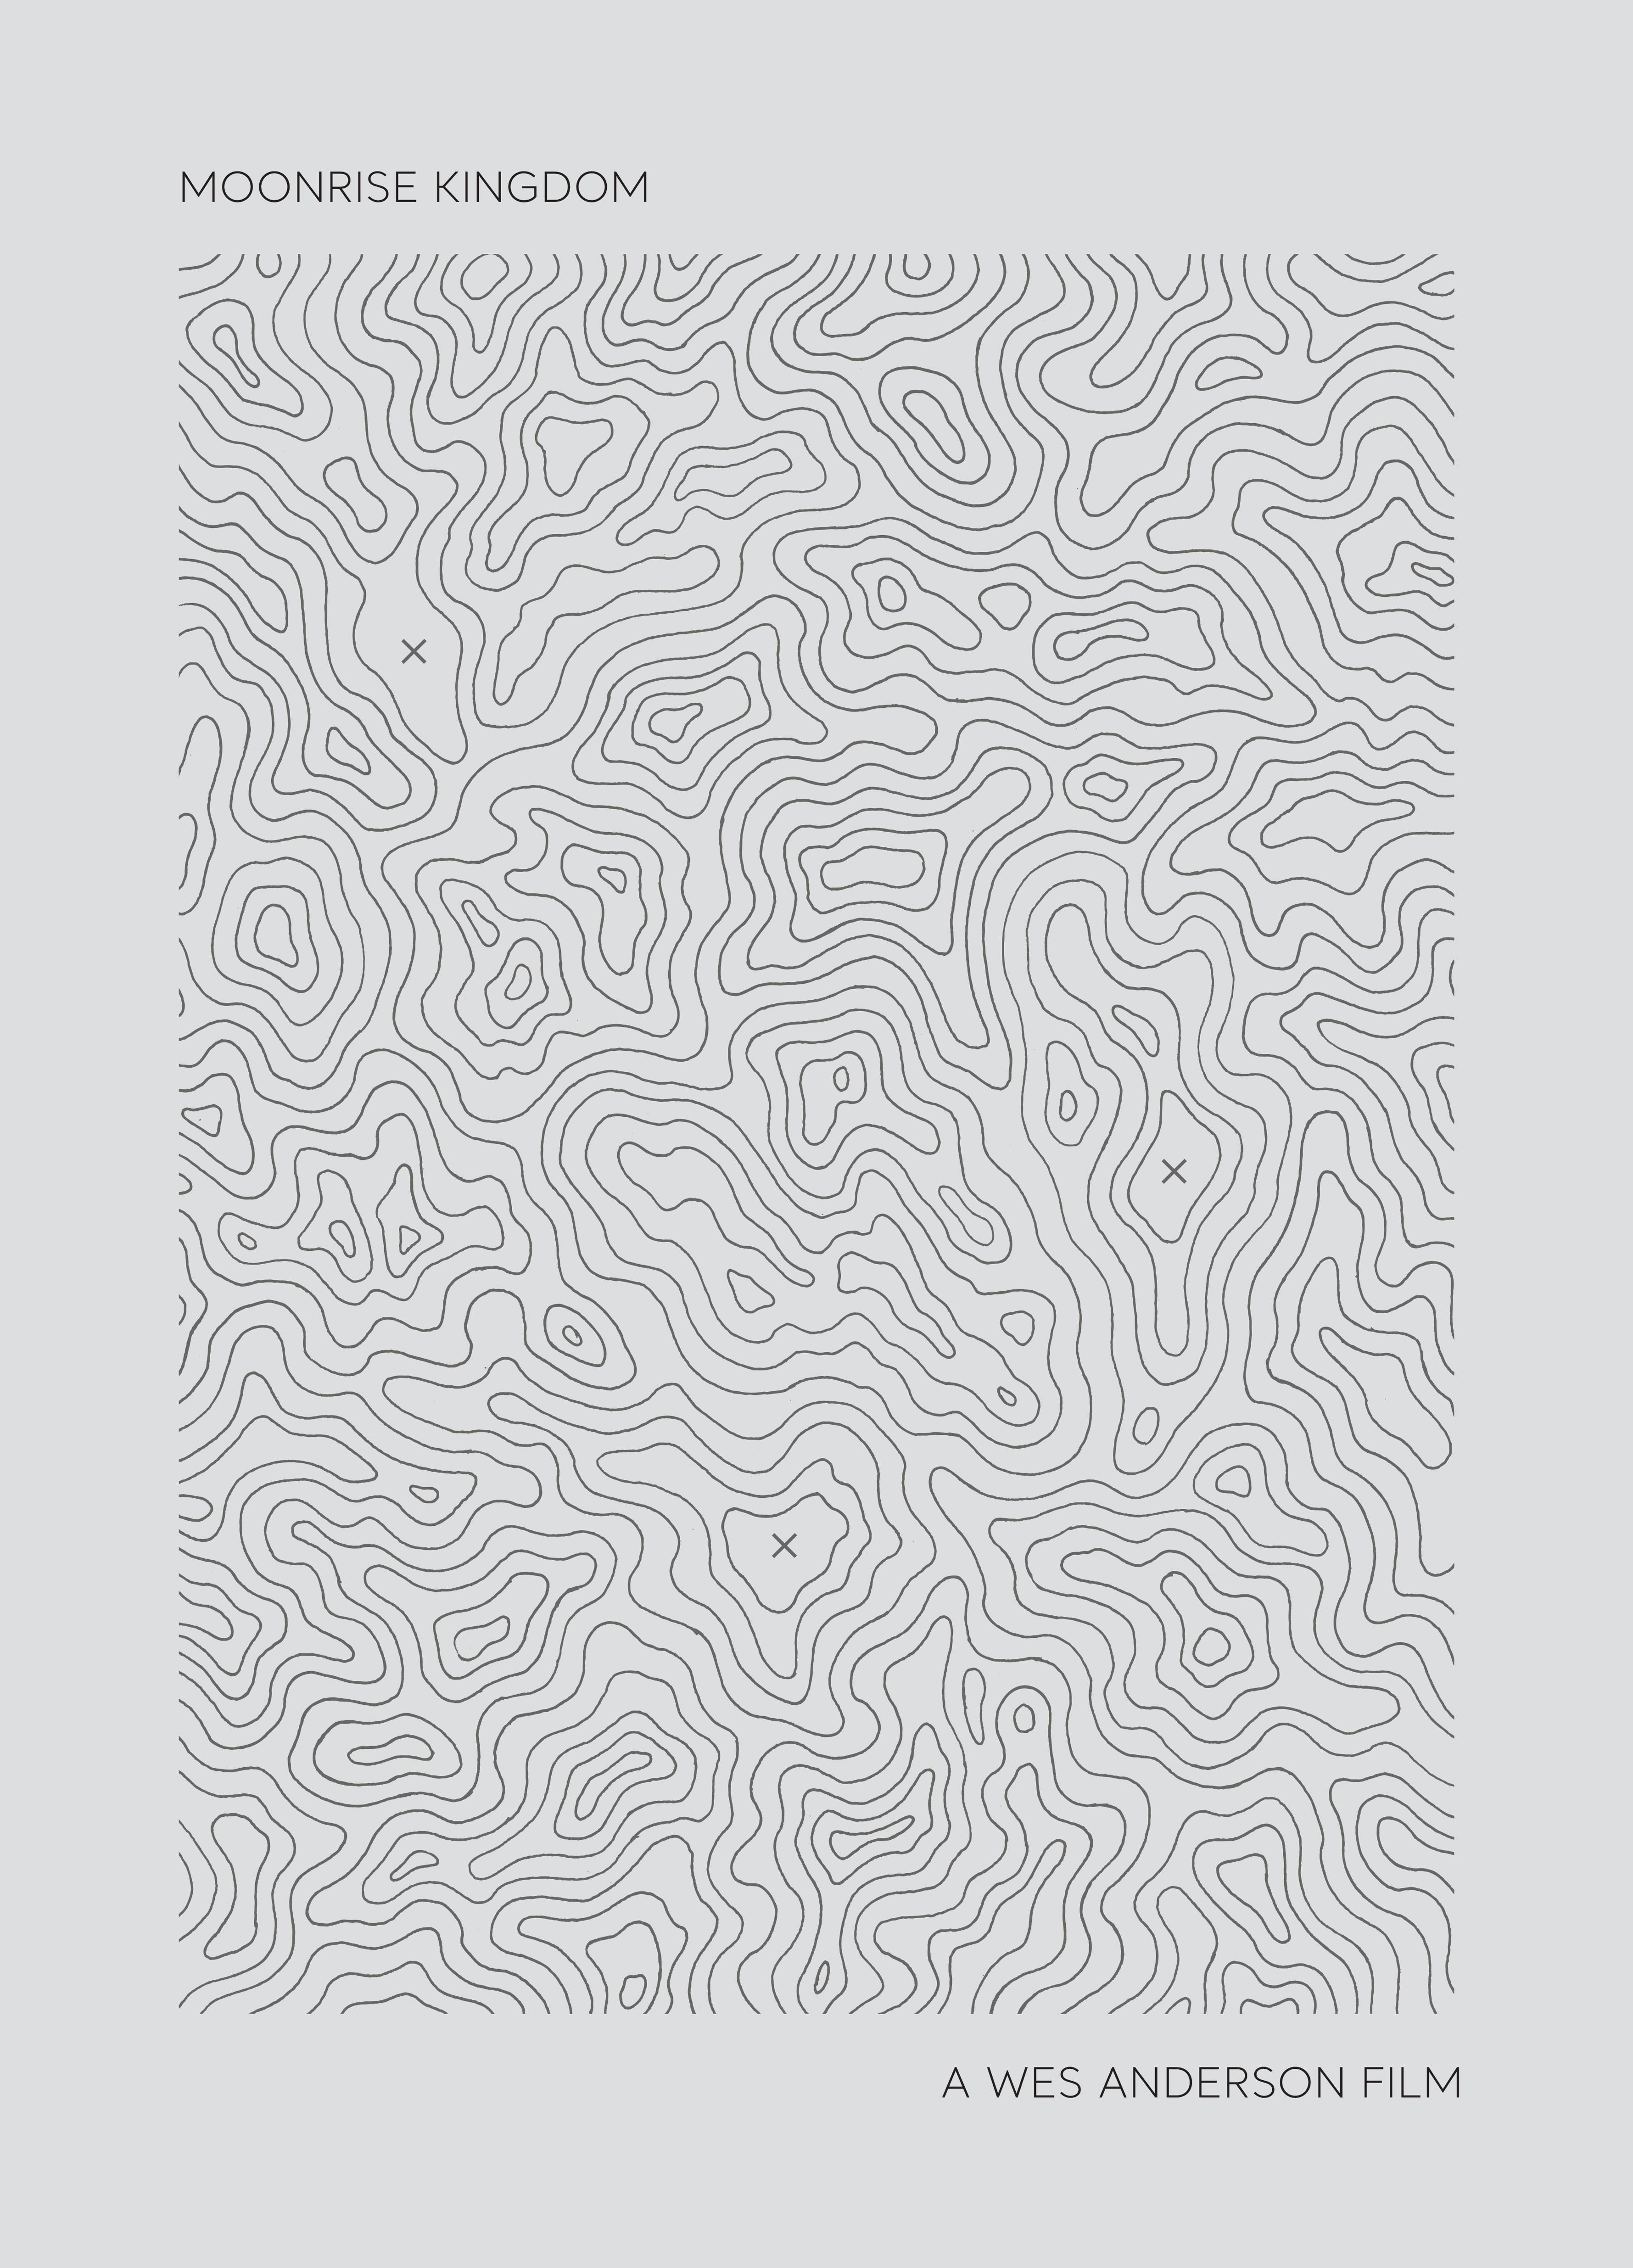 content/images/minimal-poster/MoonriseKingdomPrint.jpg